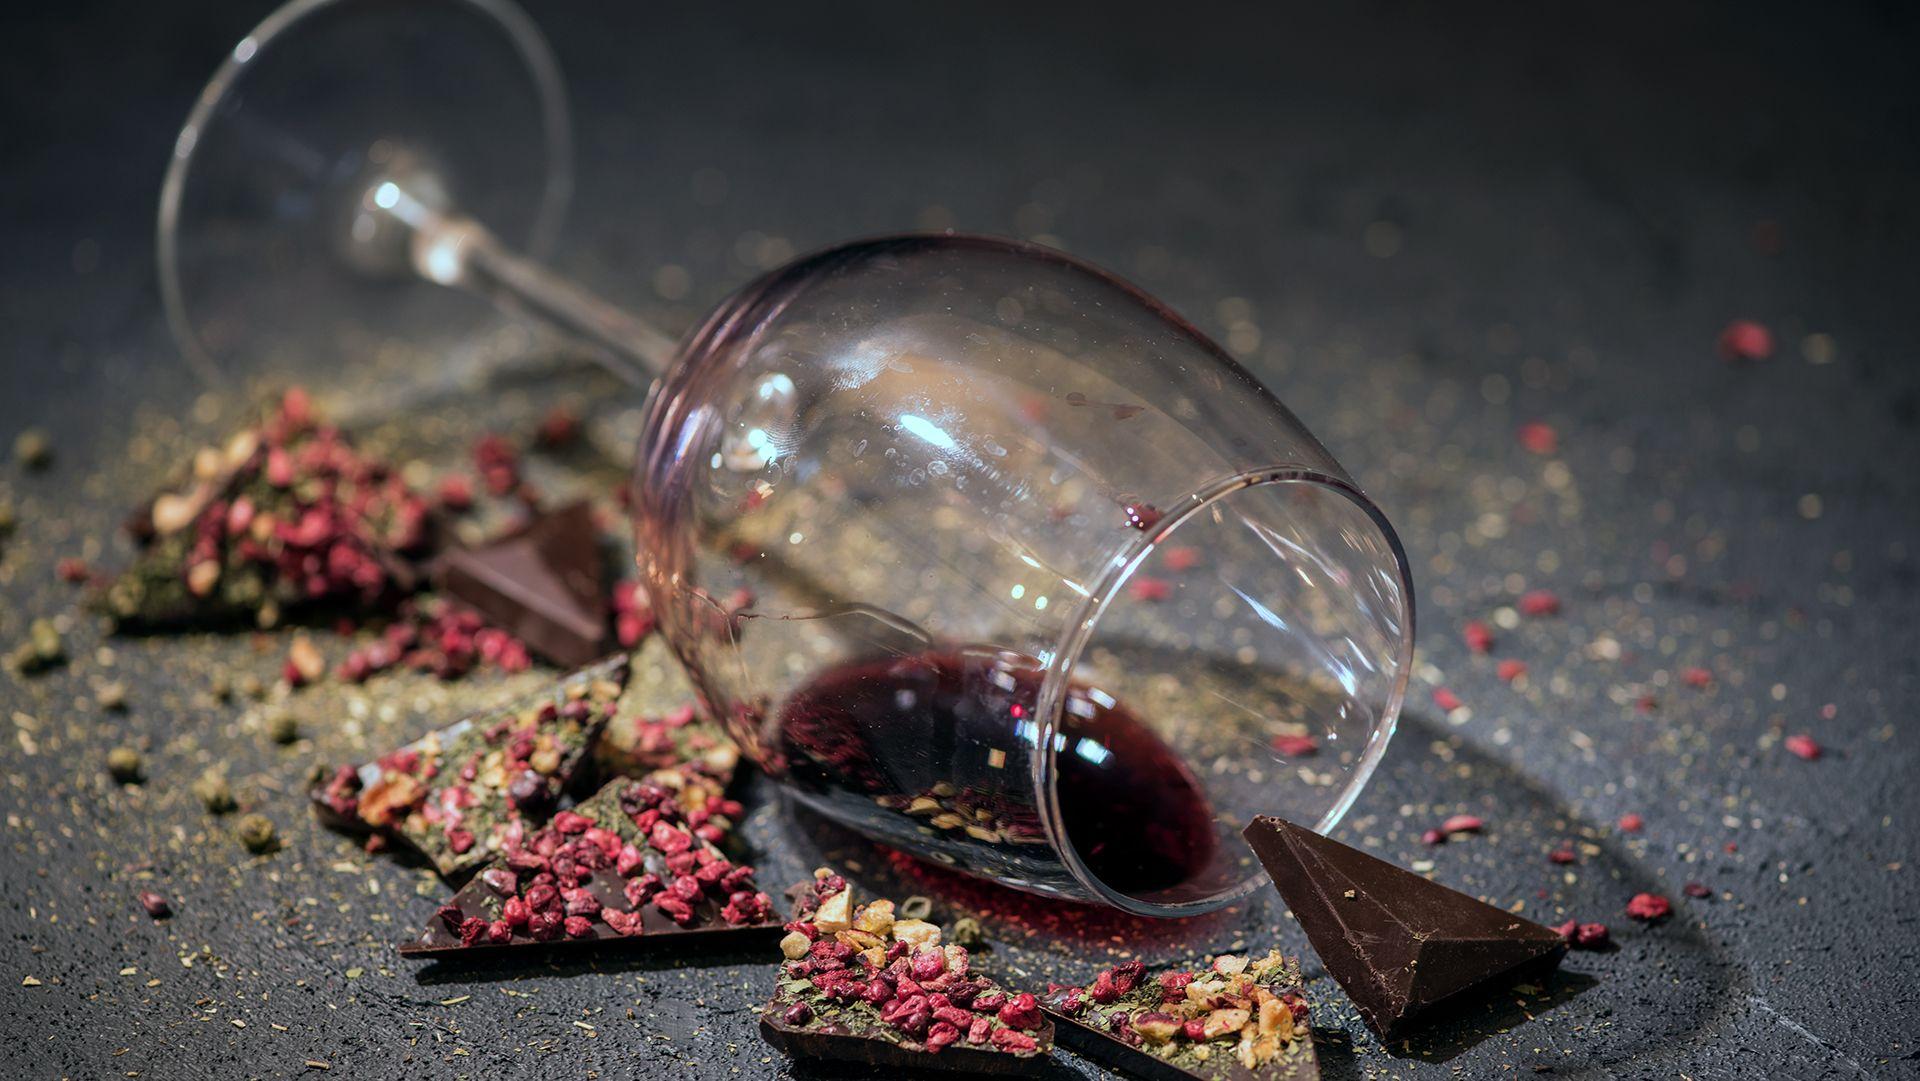 degustacija cokolade i vina